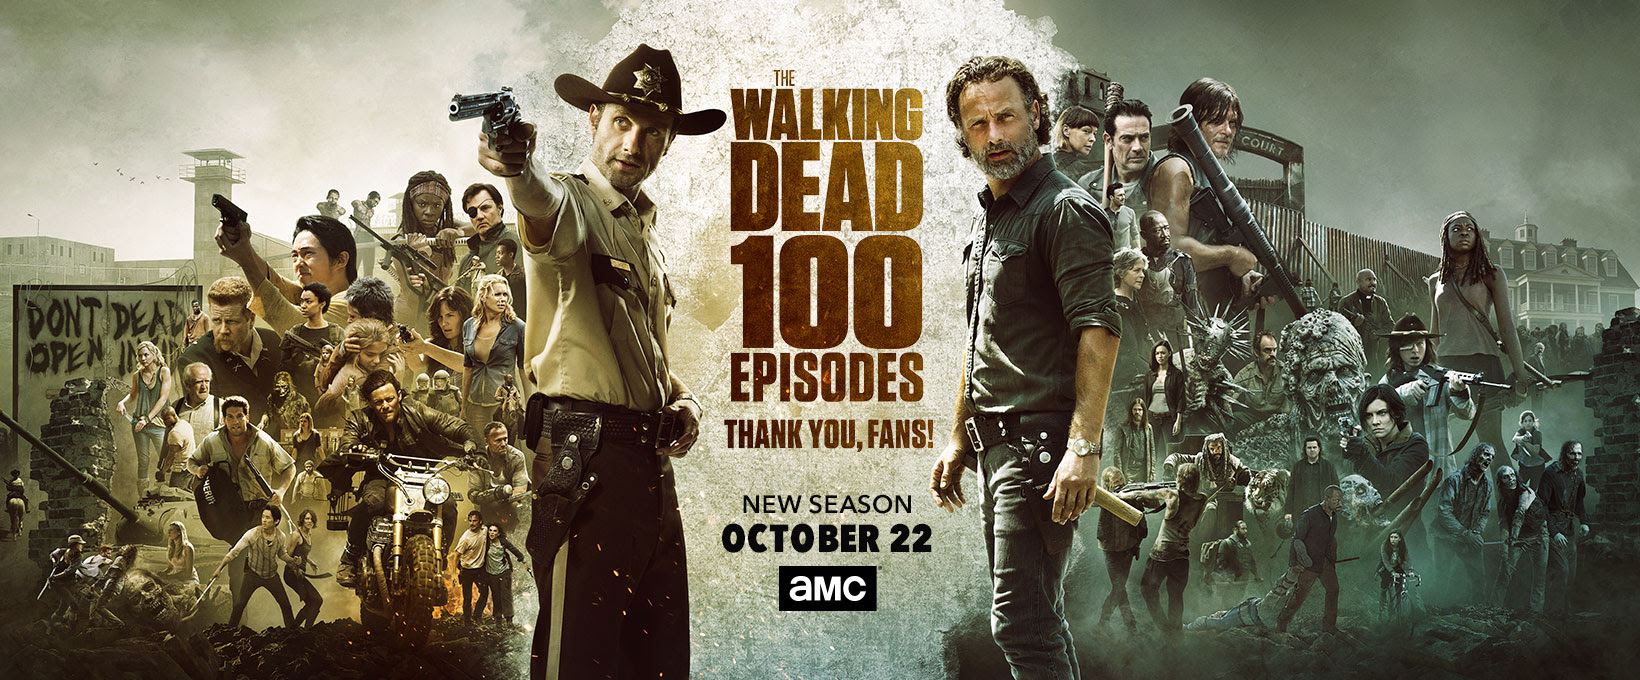 100 Episodes Poster Season 8 The Walking Dead Foto 40605627